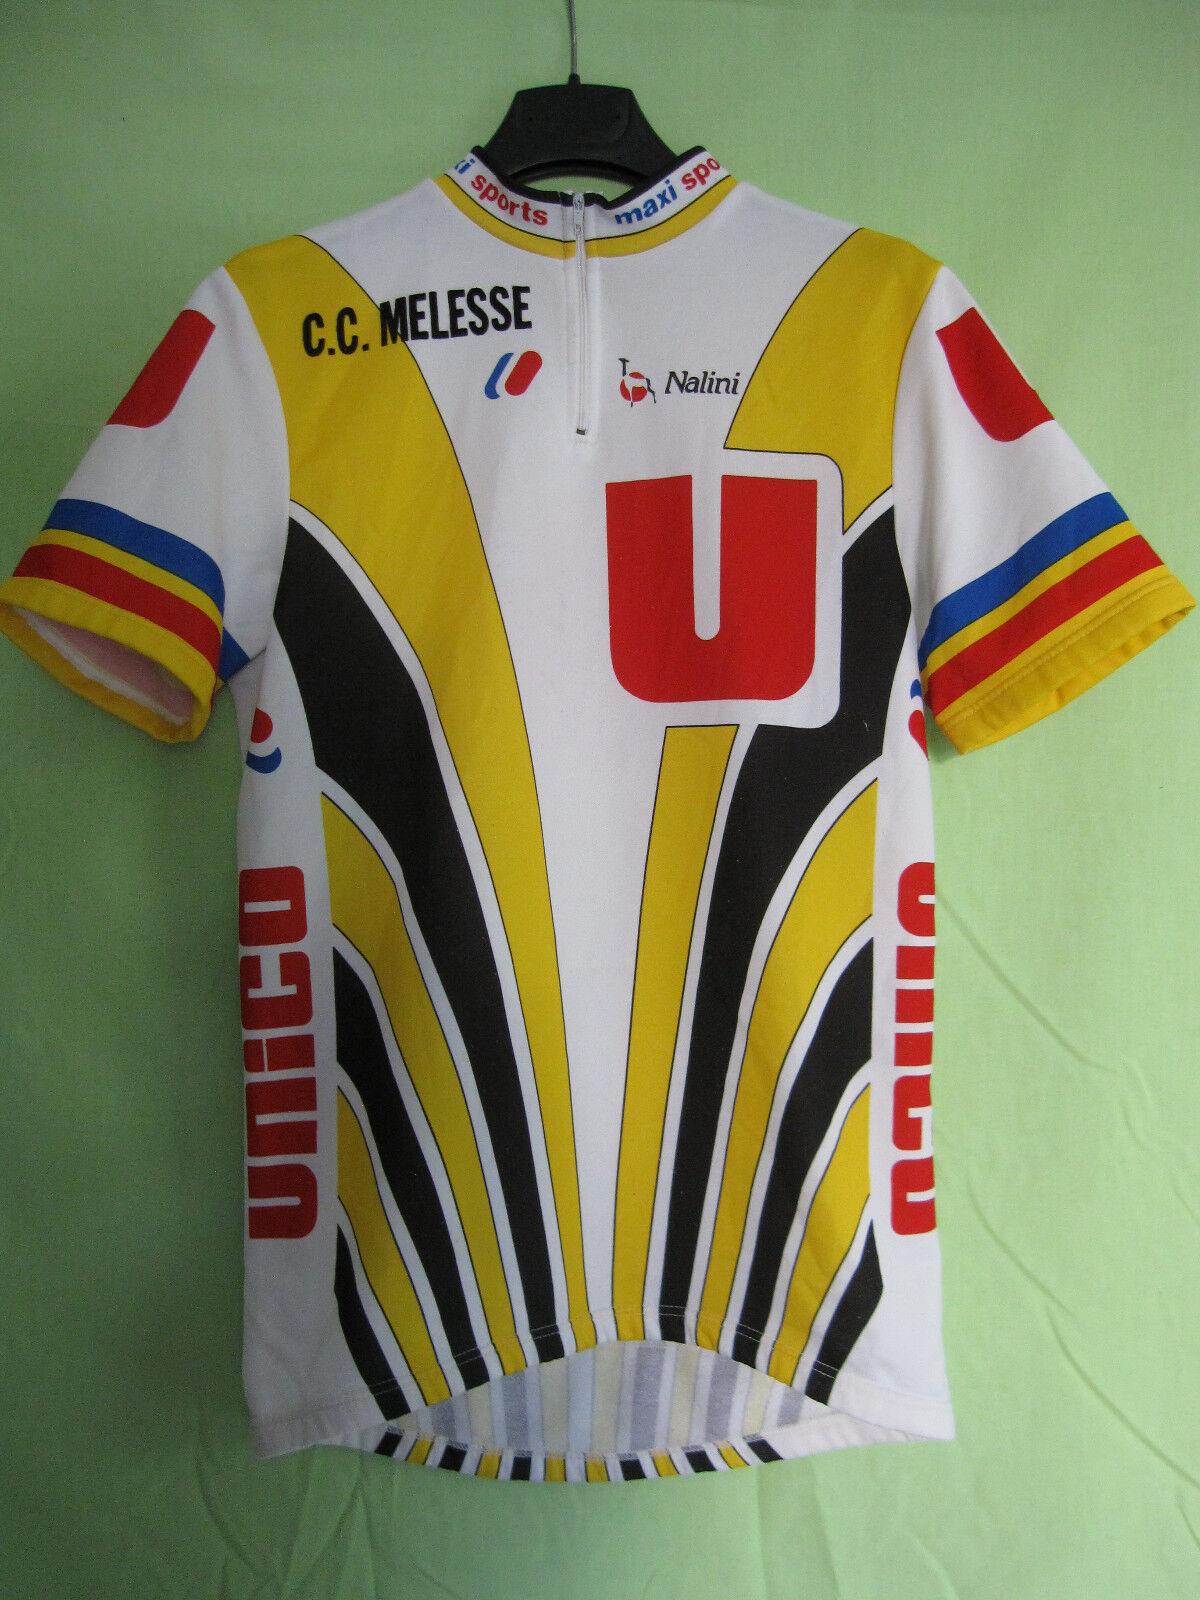 Maillot Cycliste CC vintage Systeme U Unico Nalini CC Cycliste Melesse 80'S jersey - 4 061979